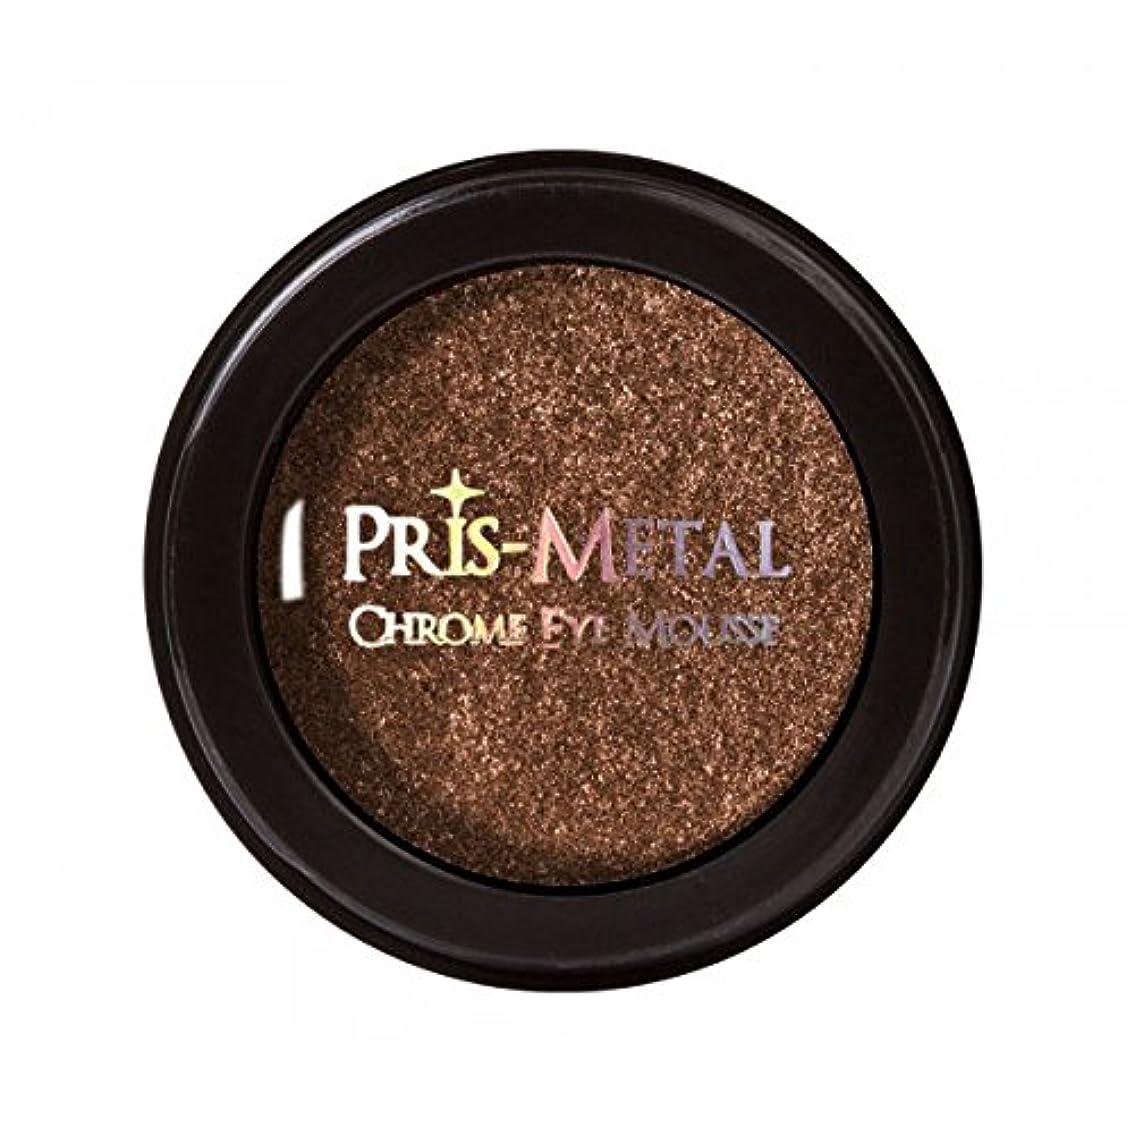 資格区画余計な(3 Pack) J. CAT BEAUTY Pris-Metal Chrome Eye Mousse - Coil Braid (並行輸入品)